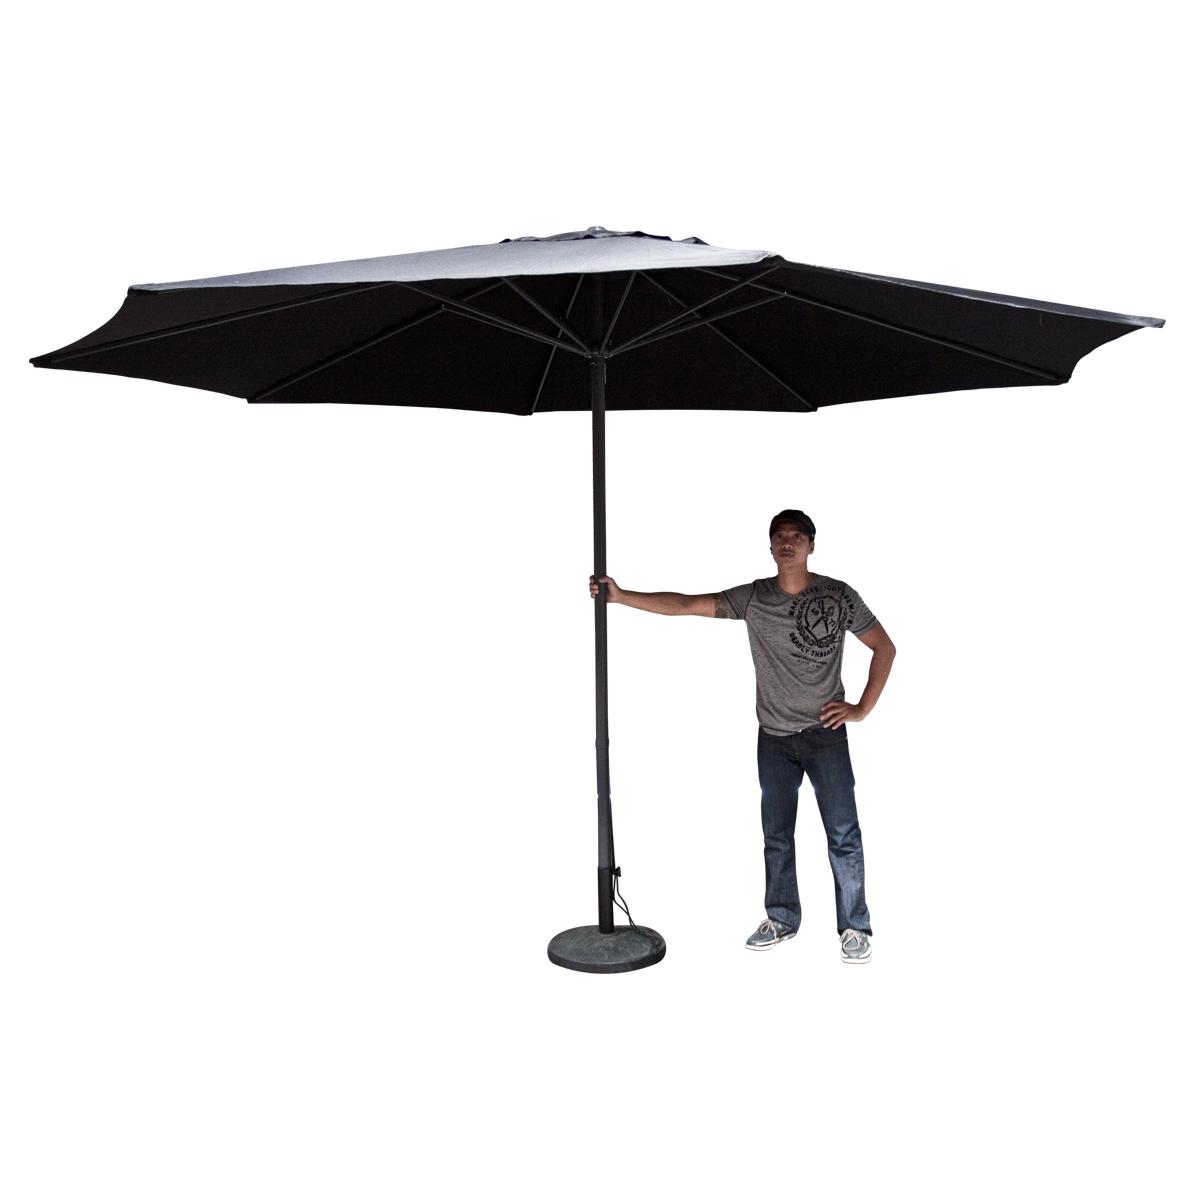 13 39 ft feet beige aluminum outdoor patio umbrella deck